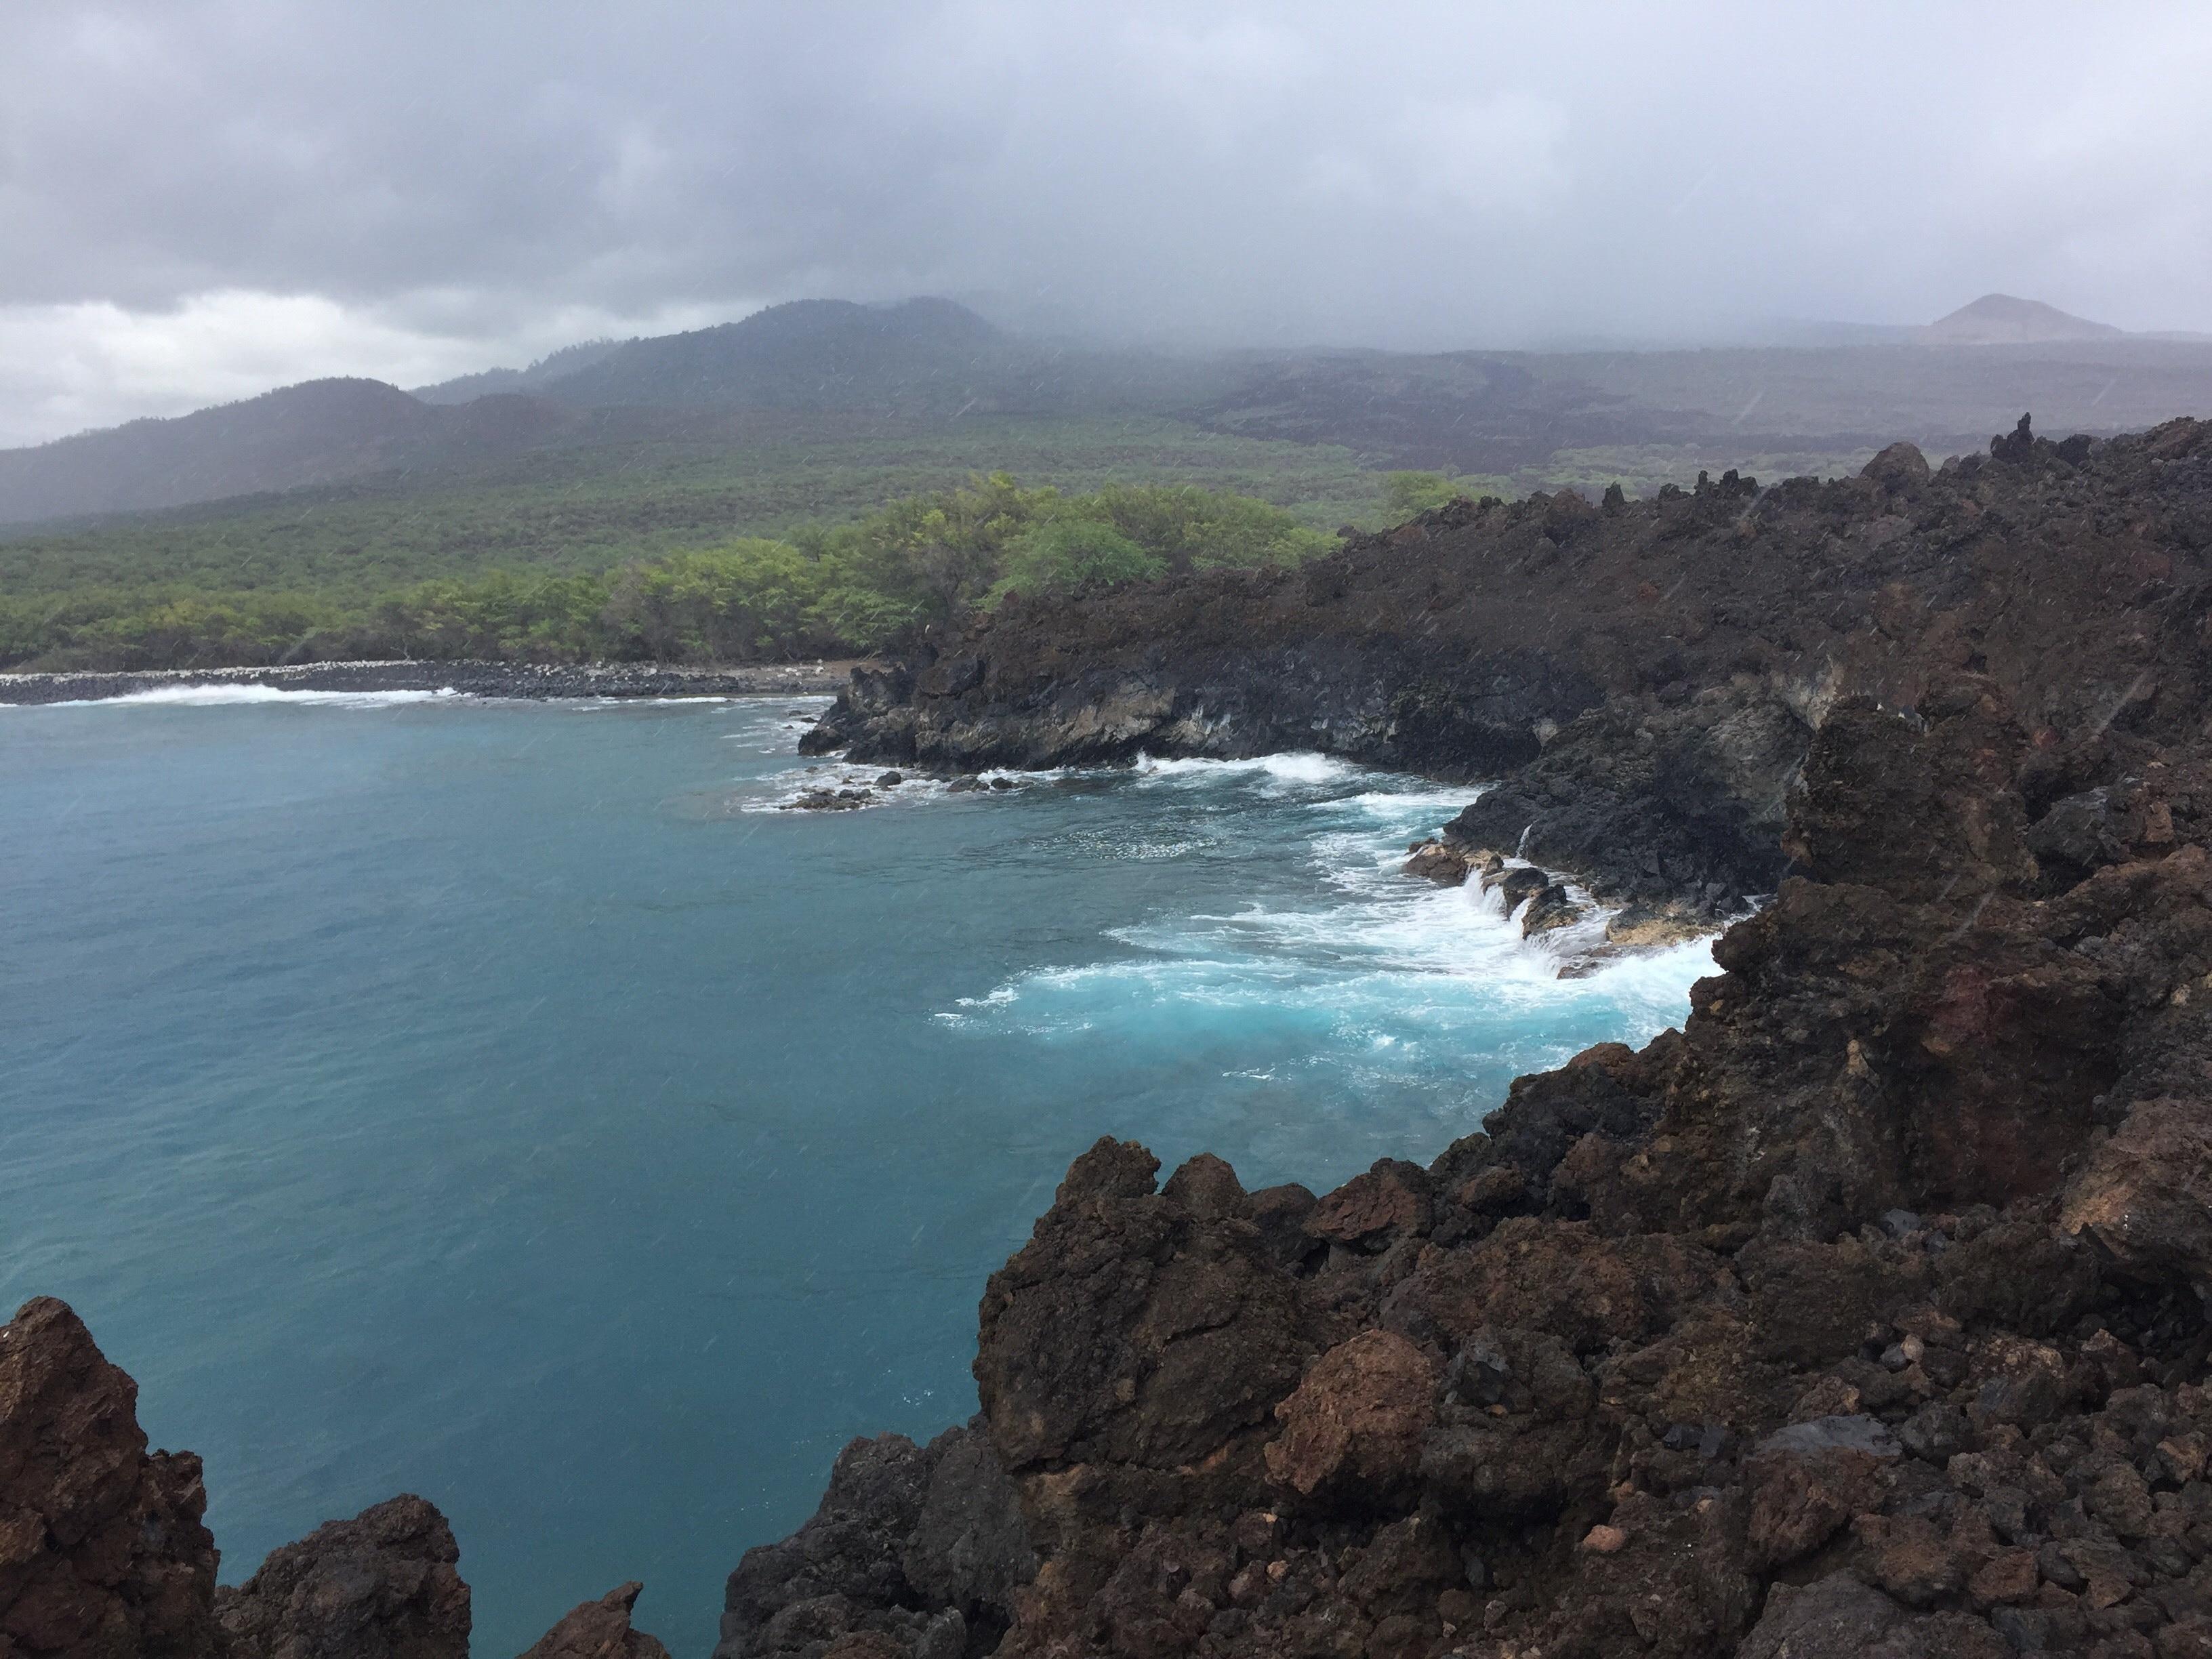 La Perouse Bay, Kula, Hawaii, United States of America